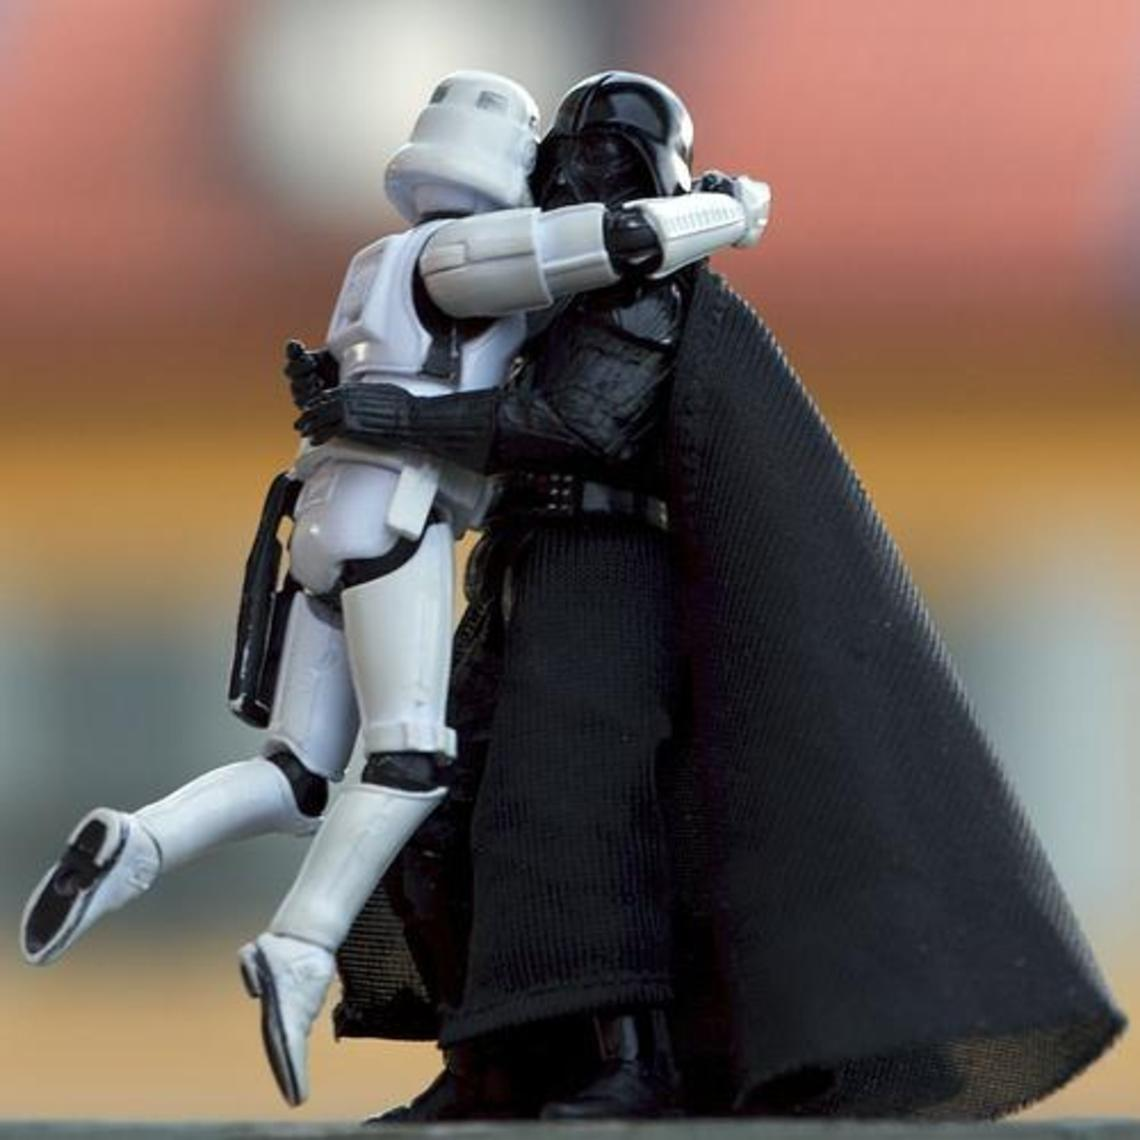 Darth vader abraza a un stormtrooper